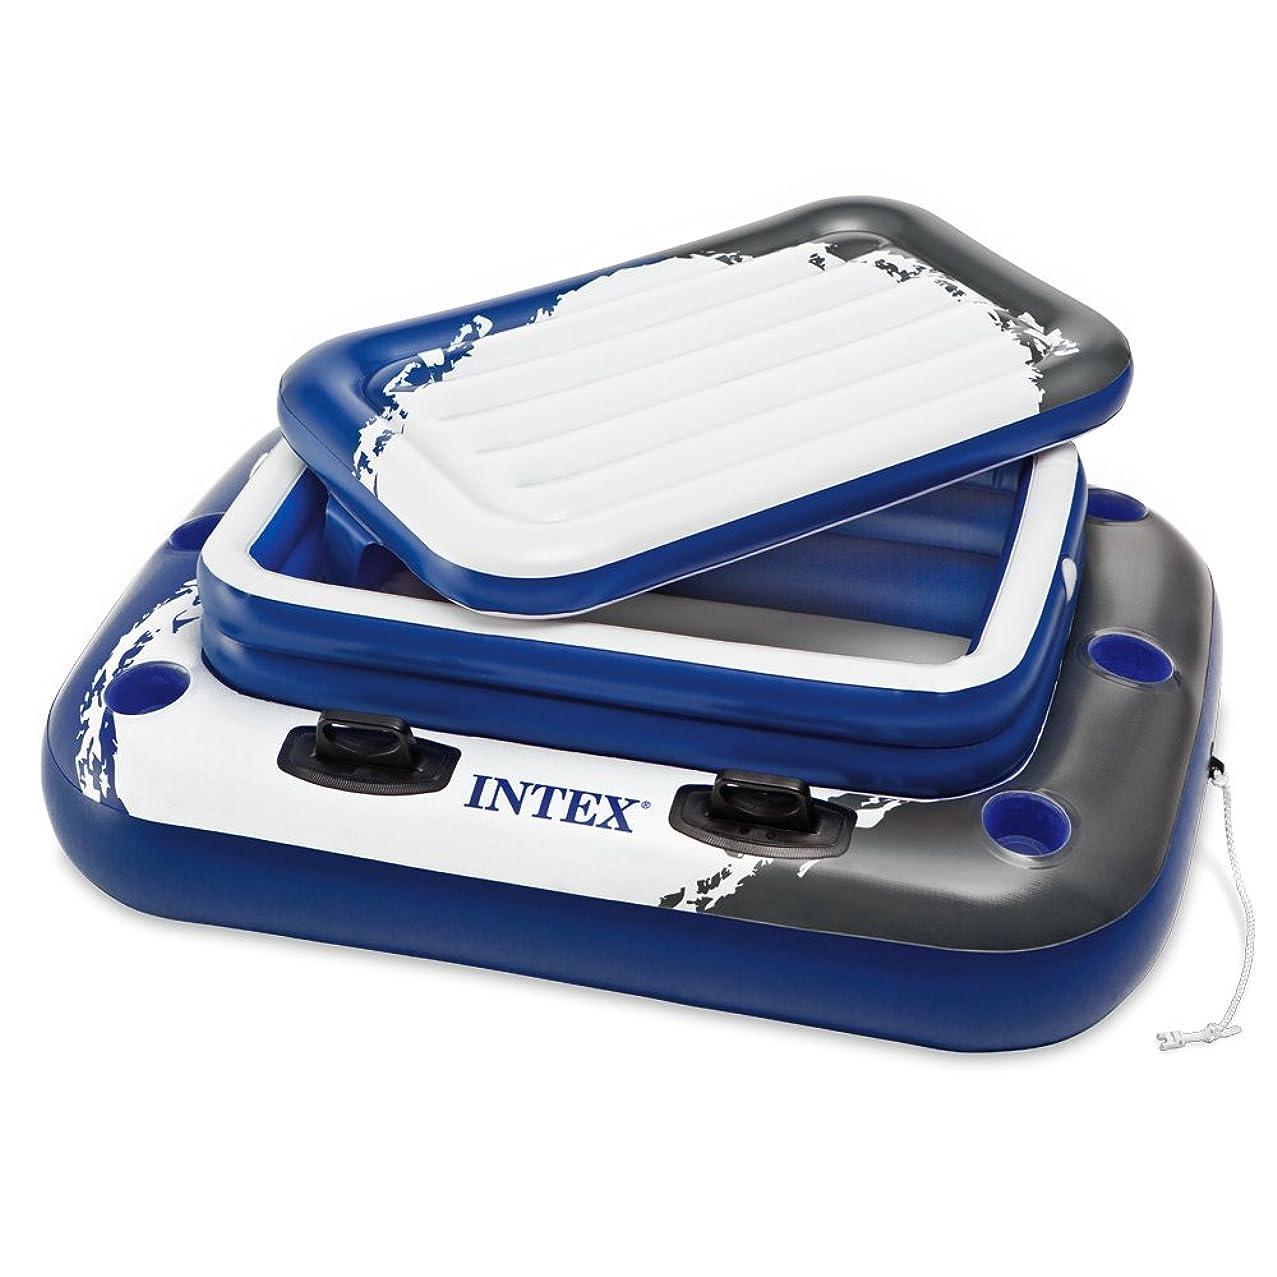 Intex Mega Chill II, Inflatable Floating Cooler, 48